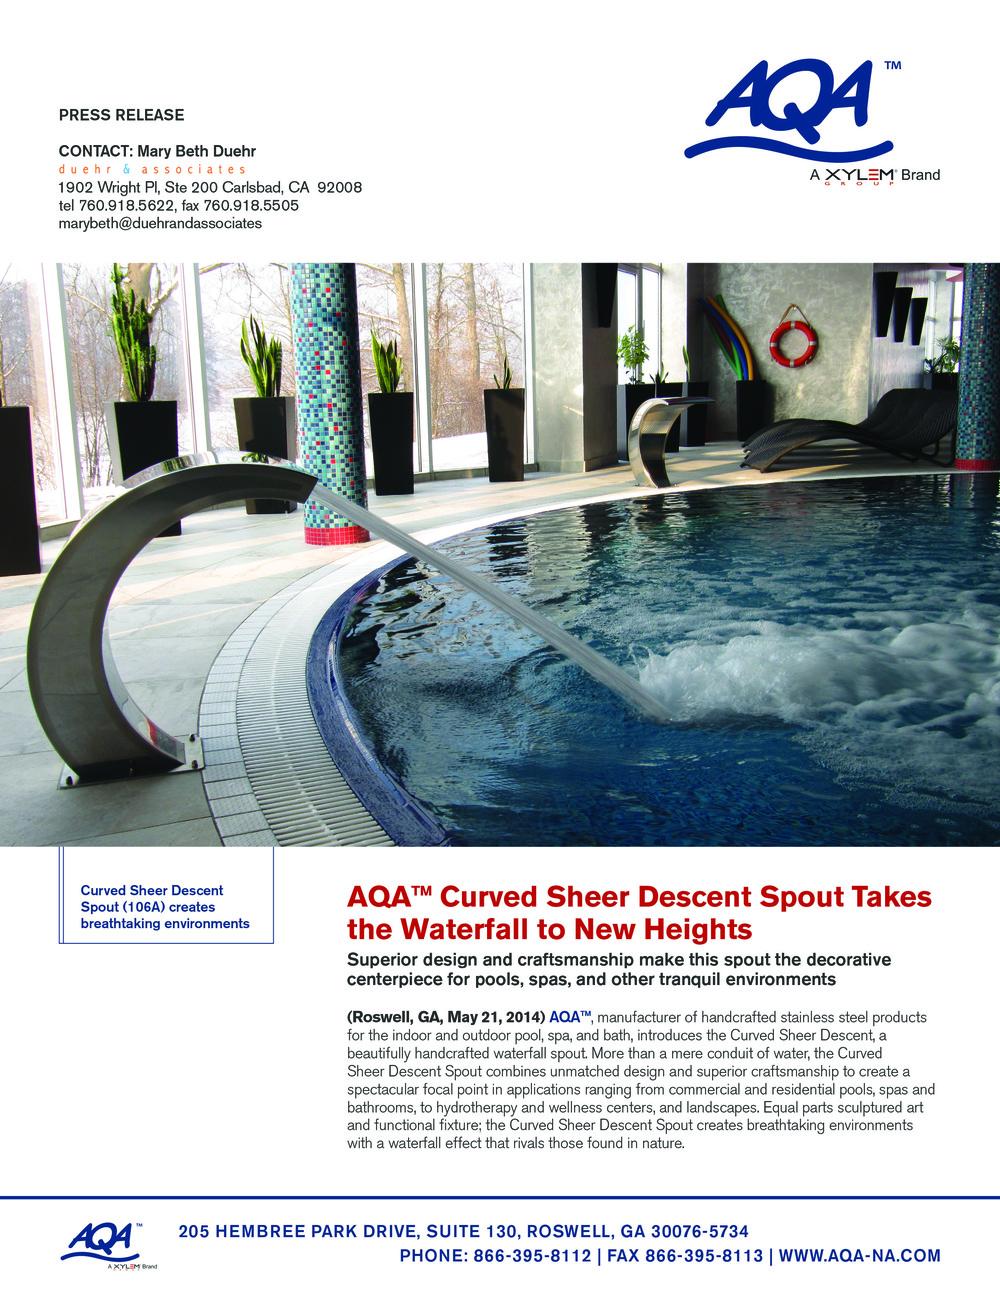 AQA Curved Sheer Descent Spout-1.jpg